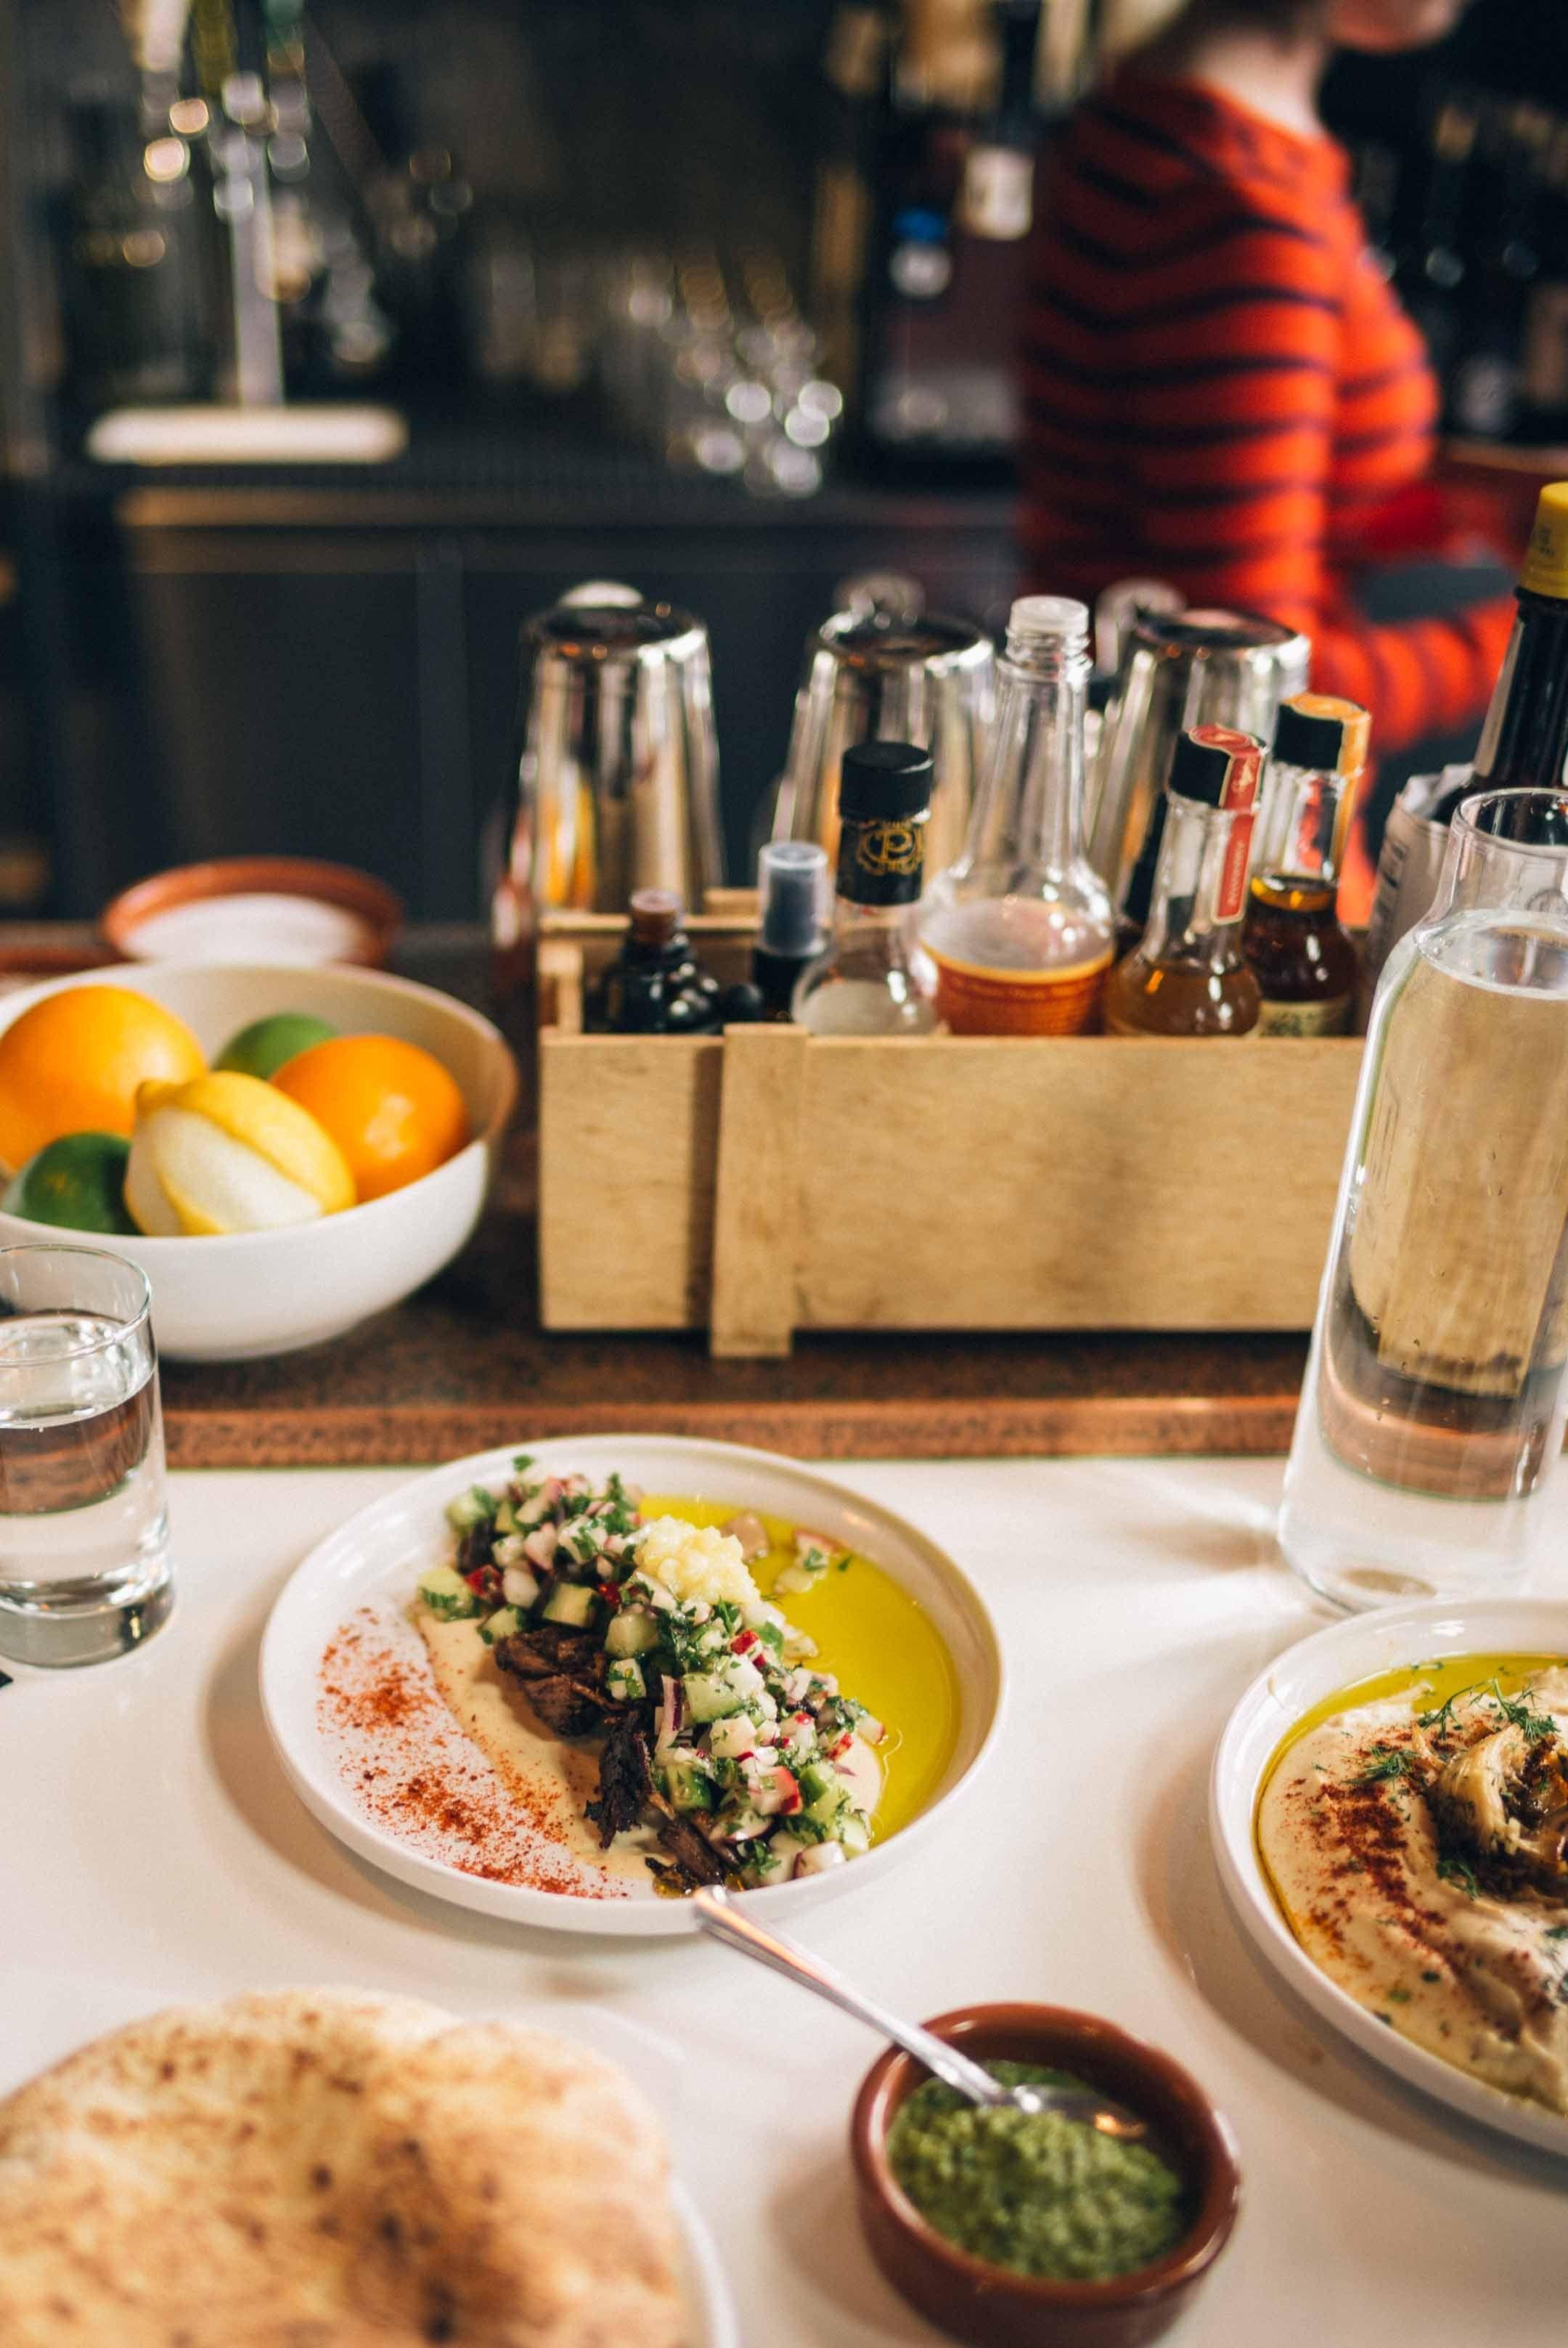 Dining Guide: 5 international restaurants worth the trip